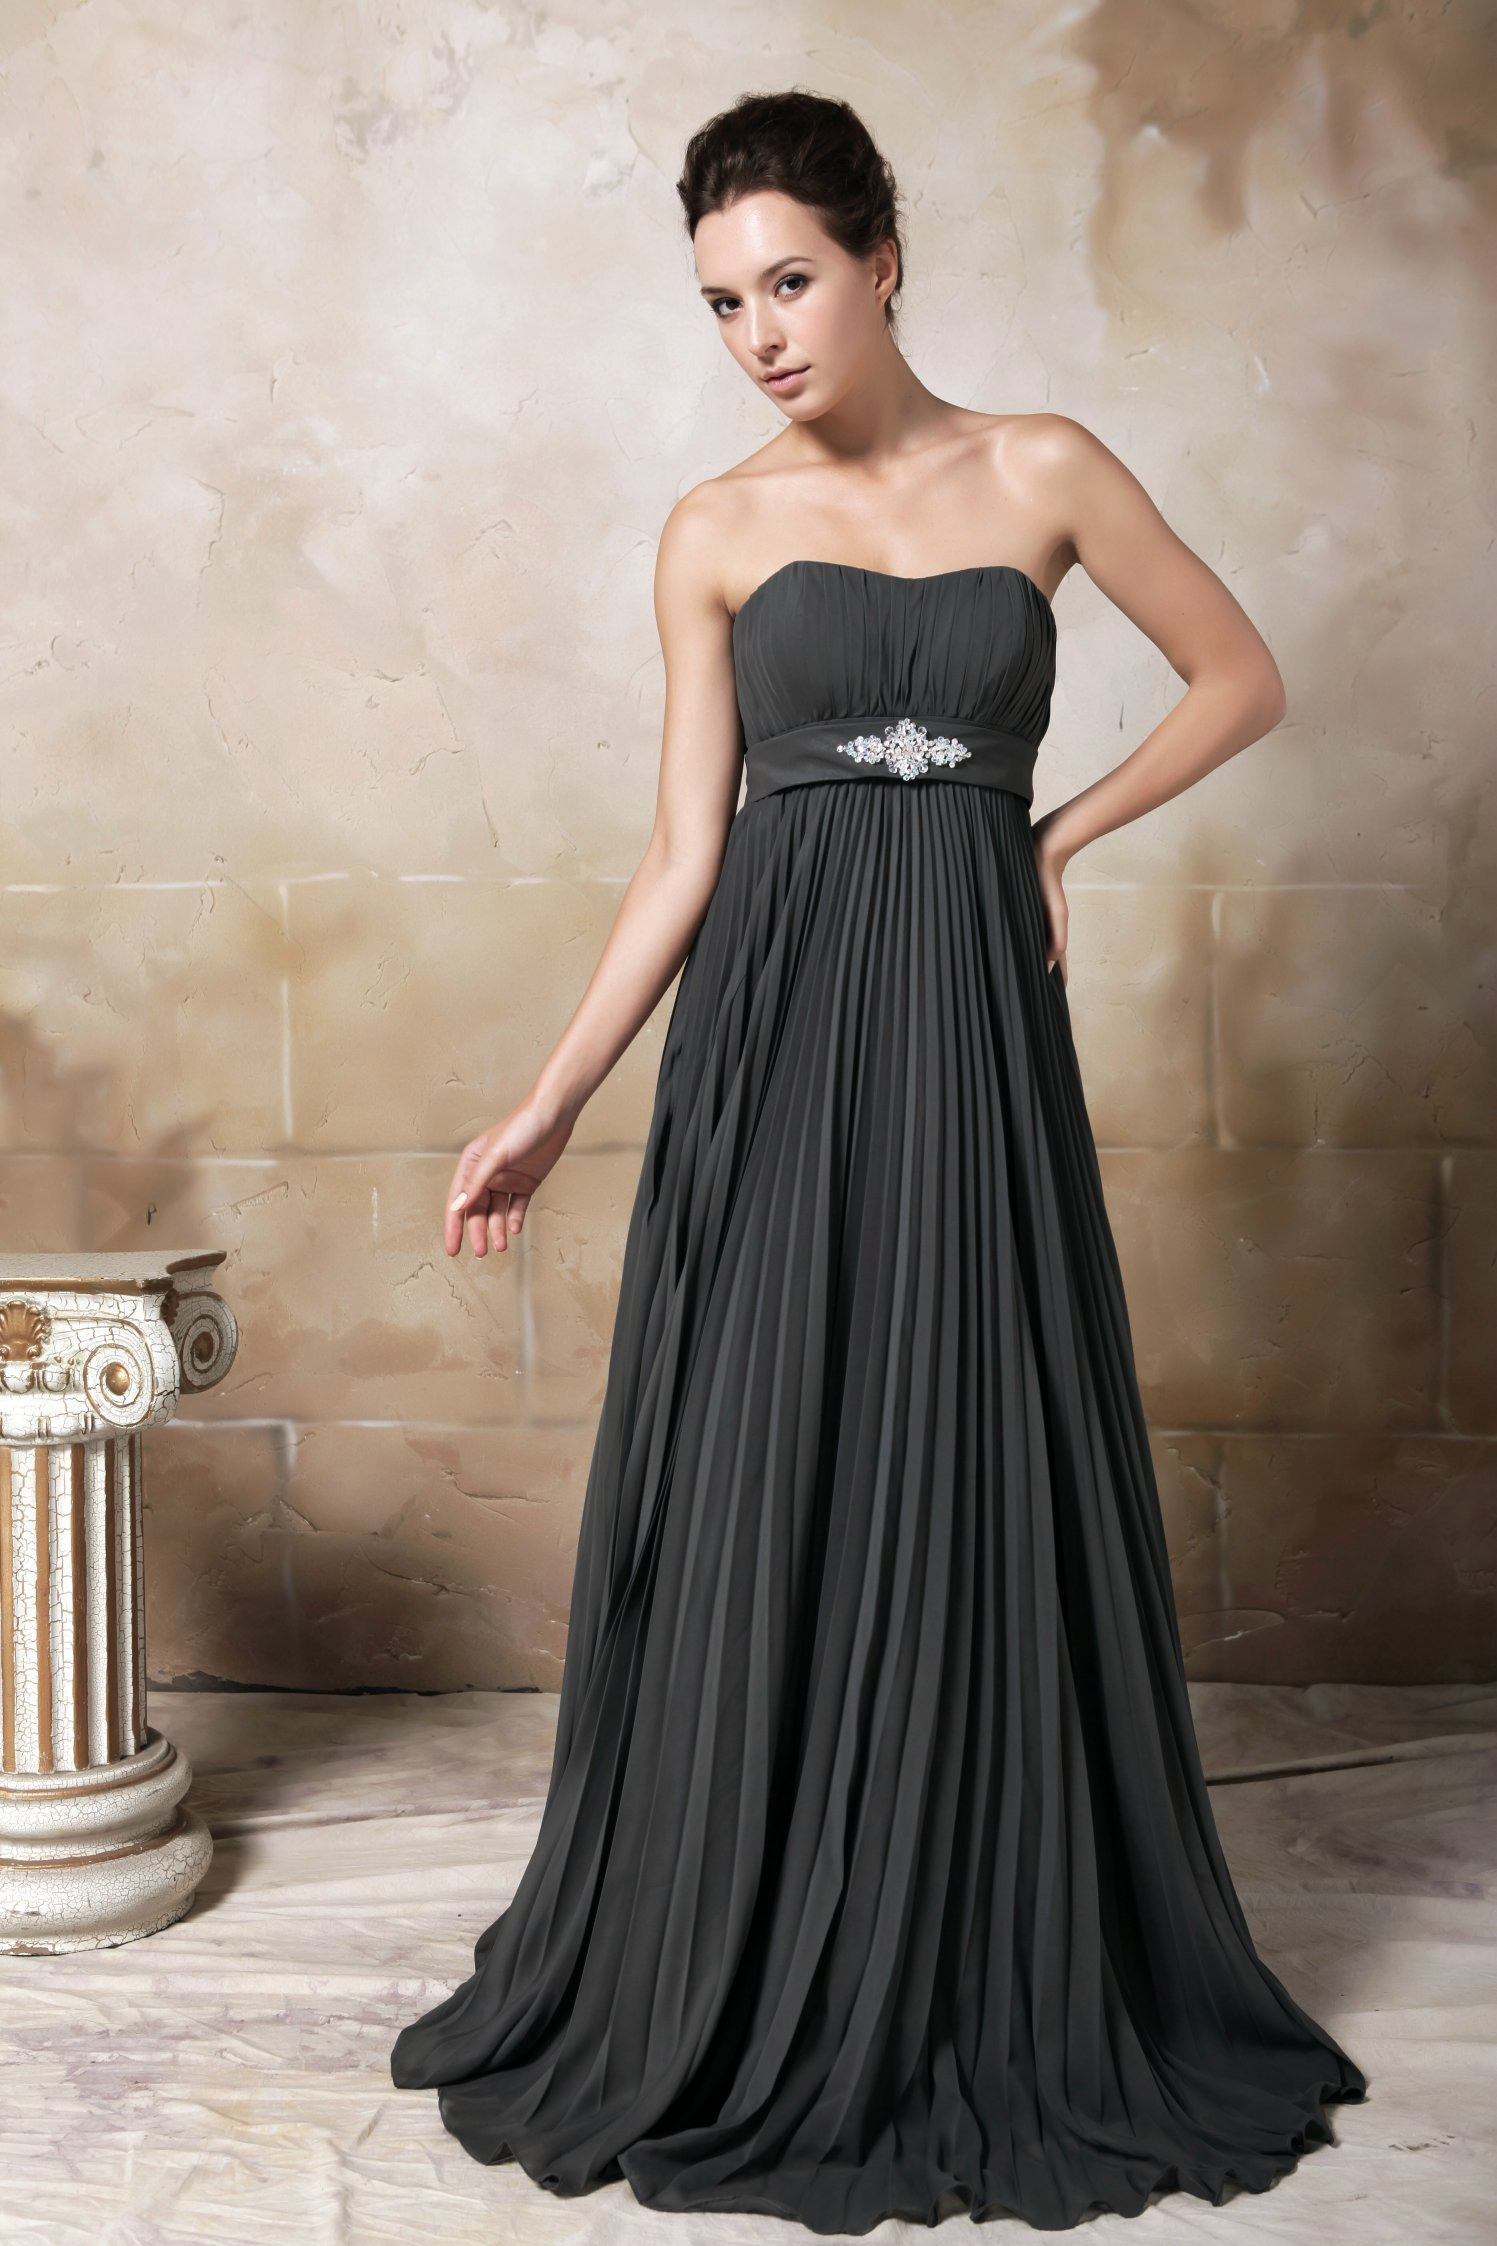 Designer Einfach Abendkleid Gr 38 Design20 Kreativ Abendkleid Gr 38 Spezialgebiet